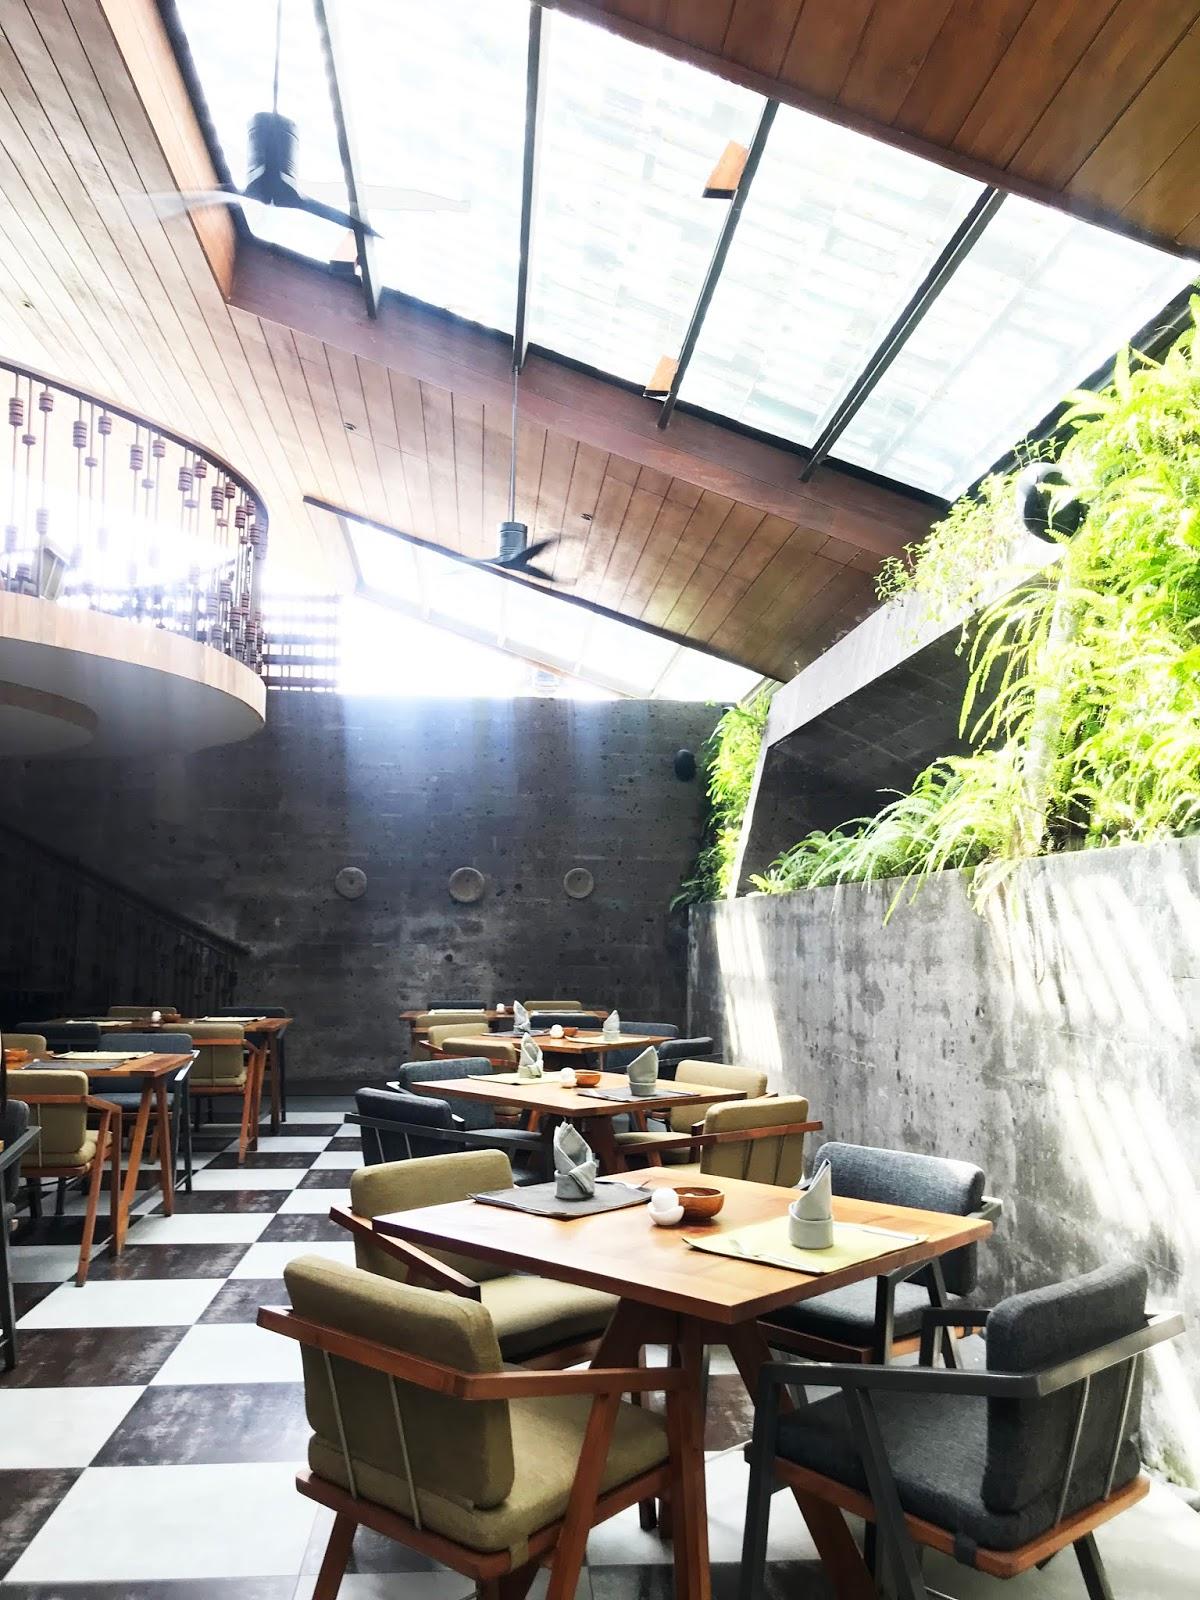 The Santai - Gong Restaurant